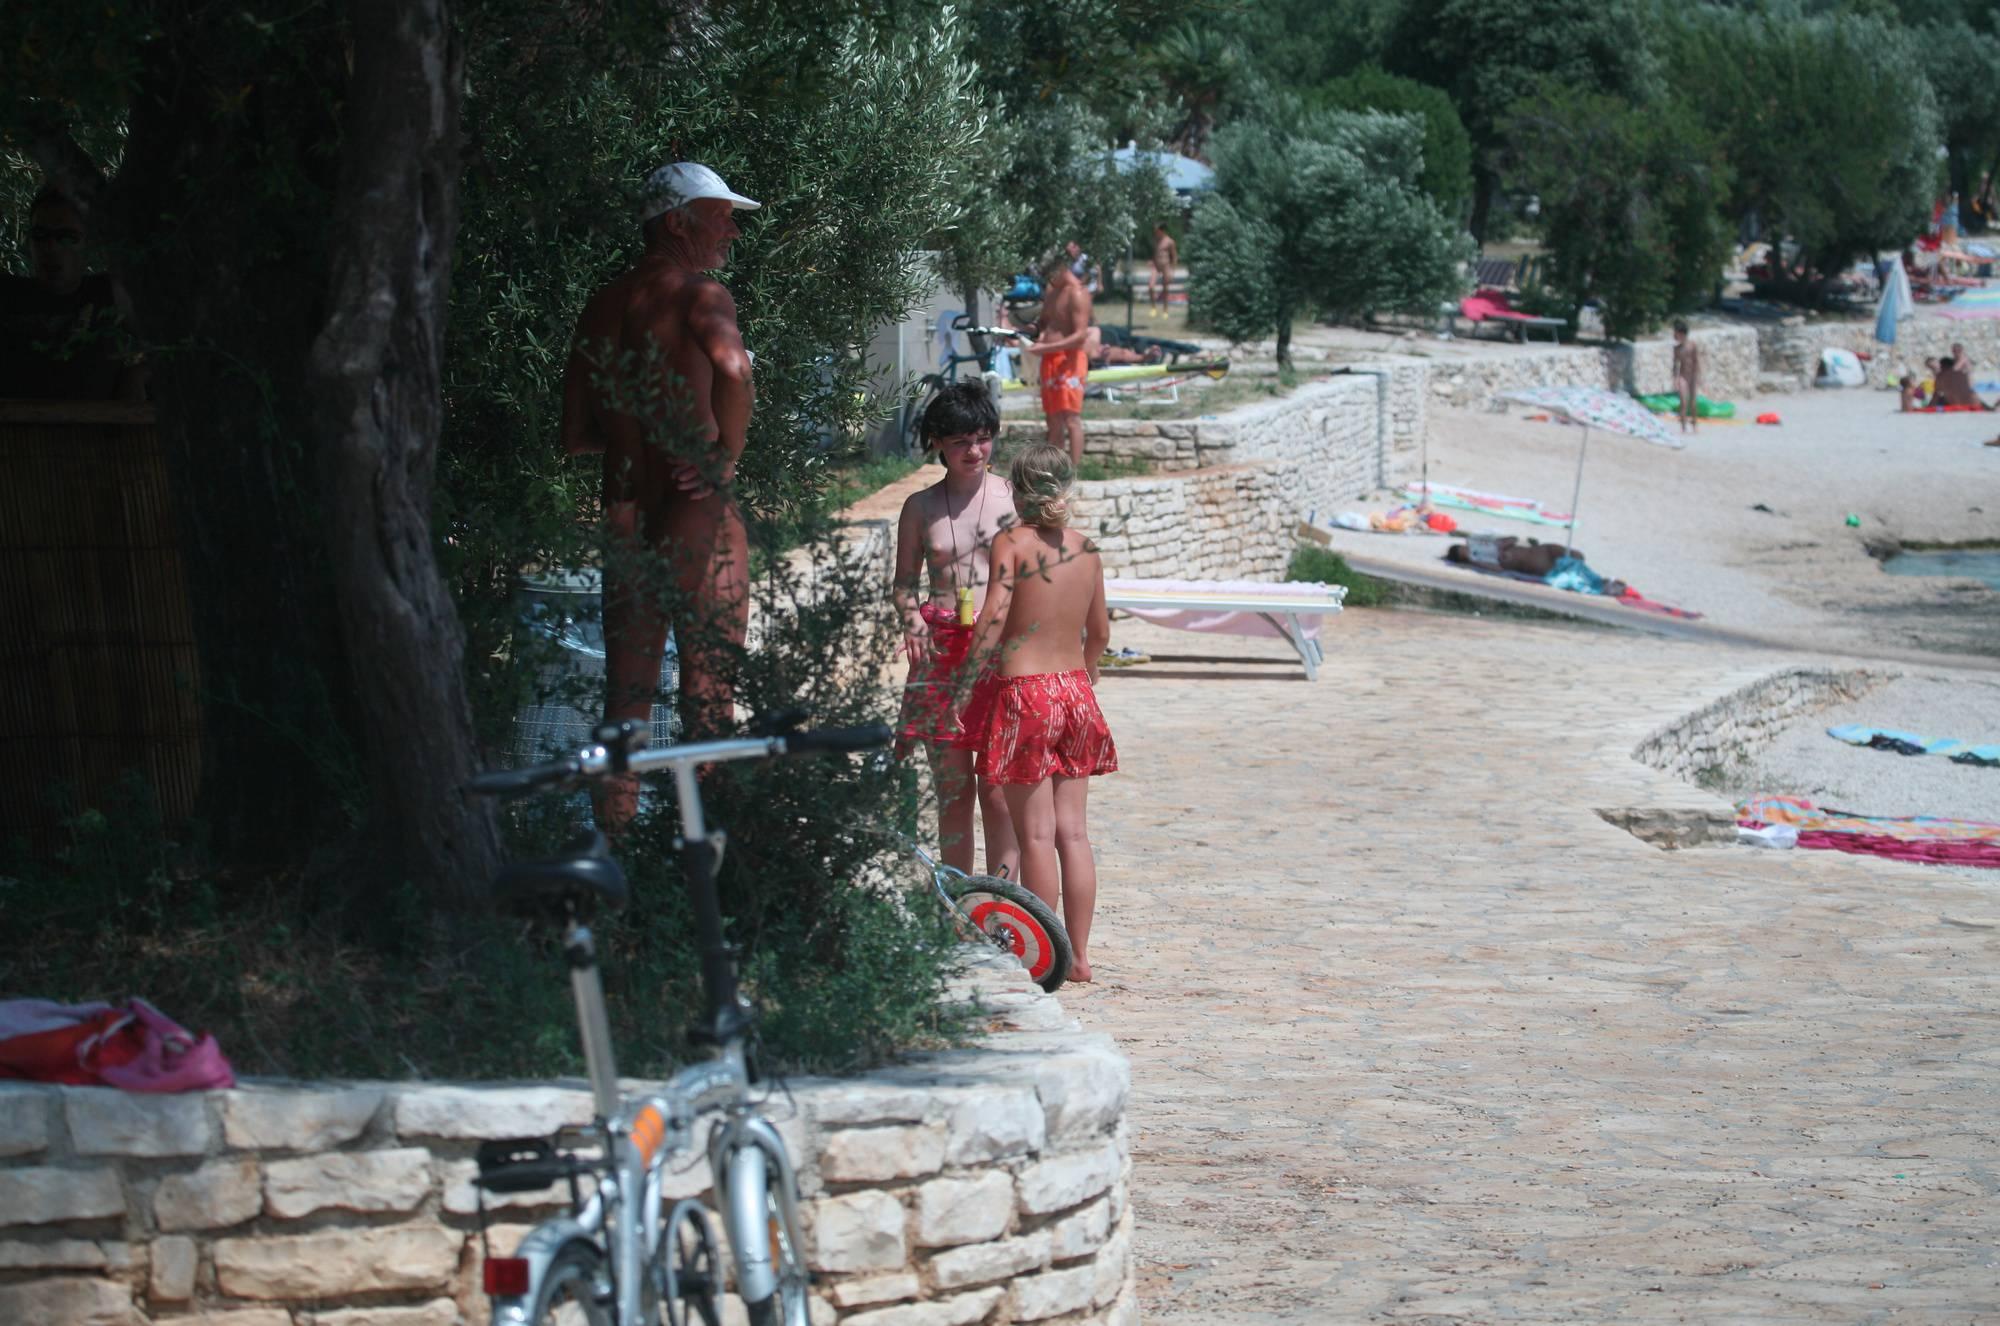 Nudist Pics Naturist Girls Sunscreen - 2